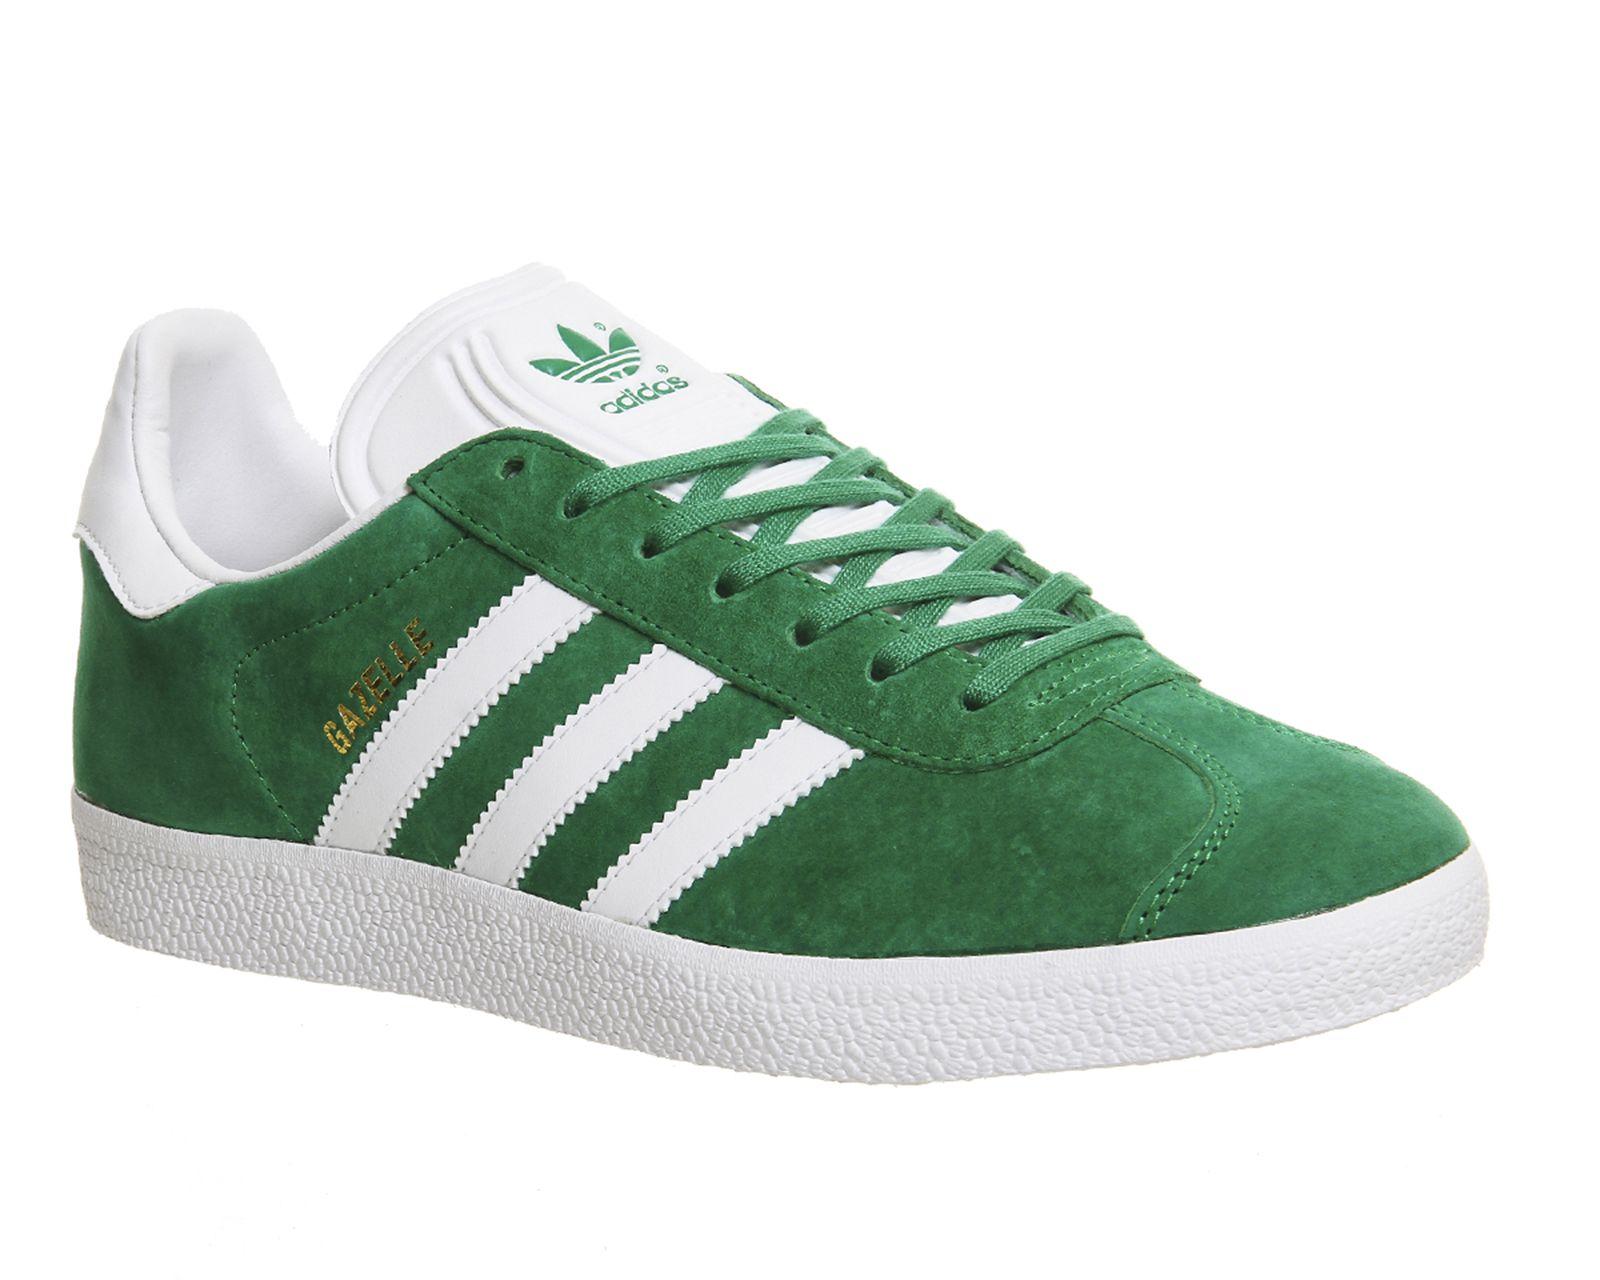 Adidas Gazelle Green White - His trainers